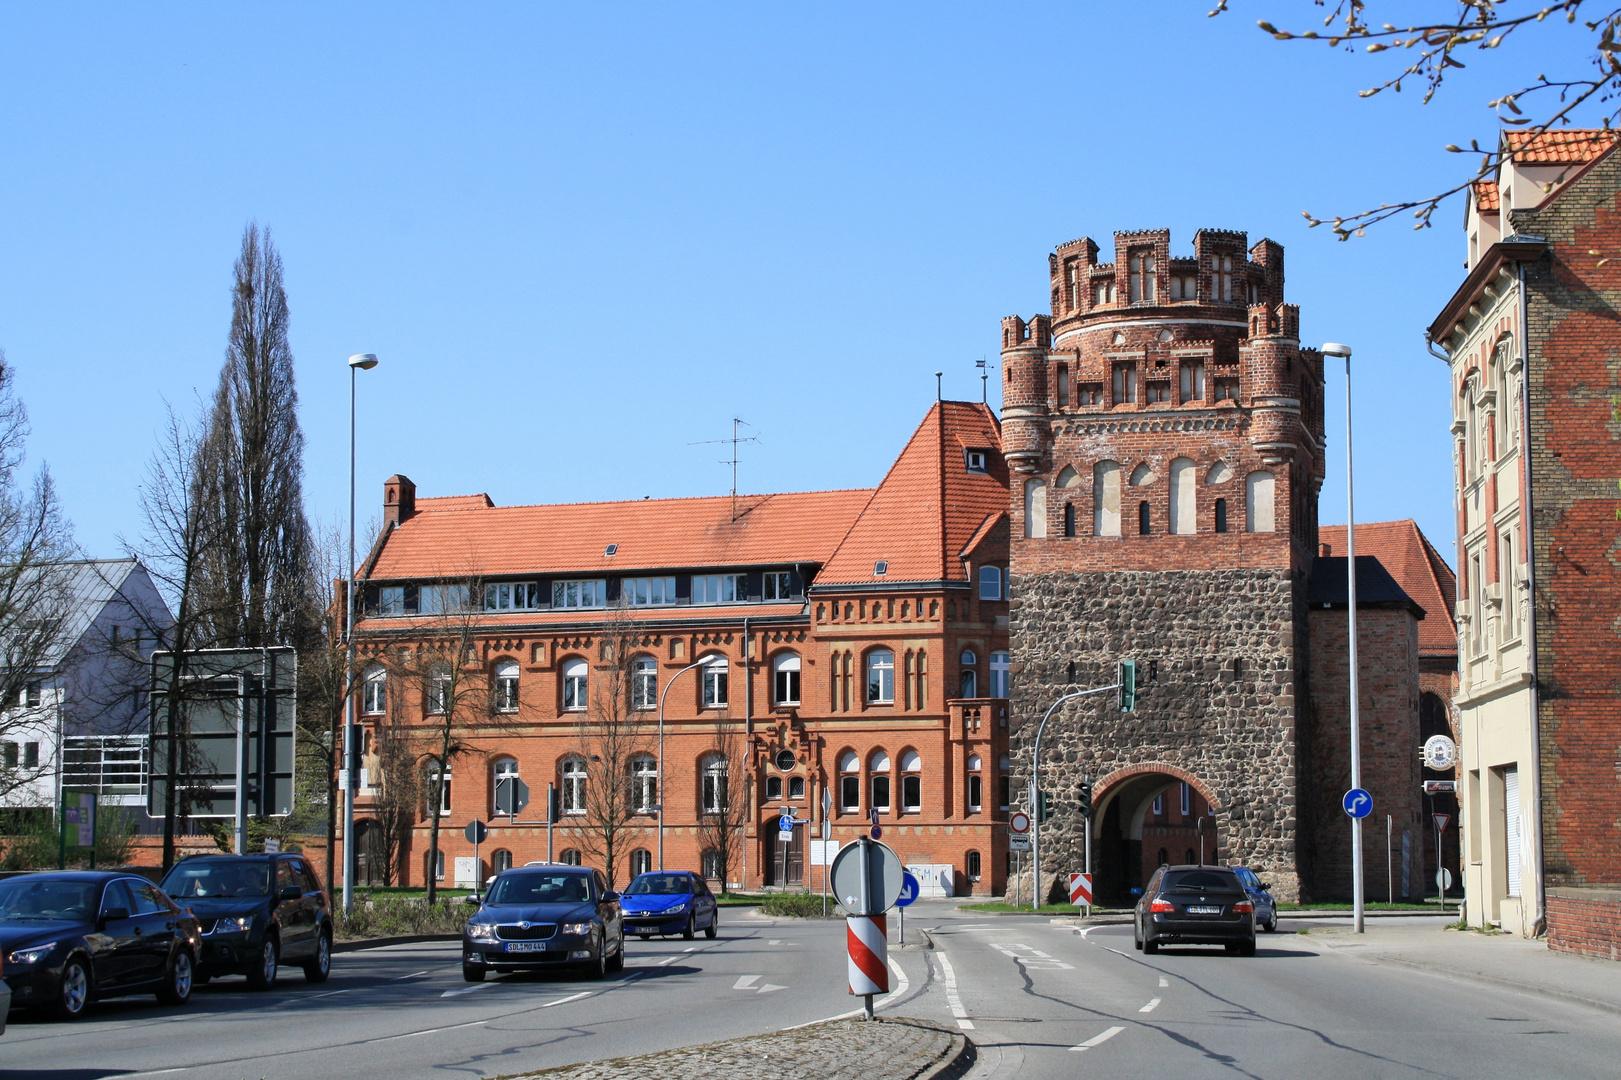 Bba Stendal tangermünder tor in stendal foto bild architektur türme